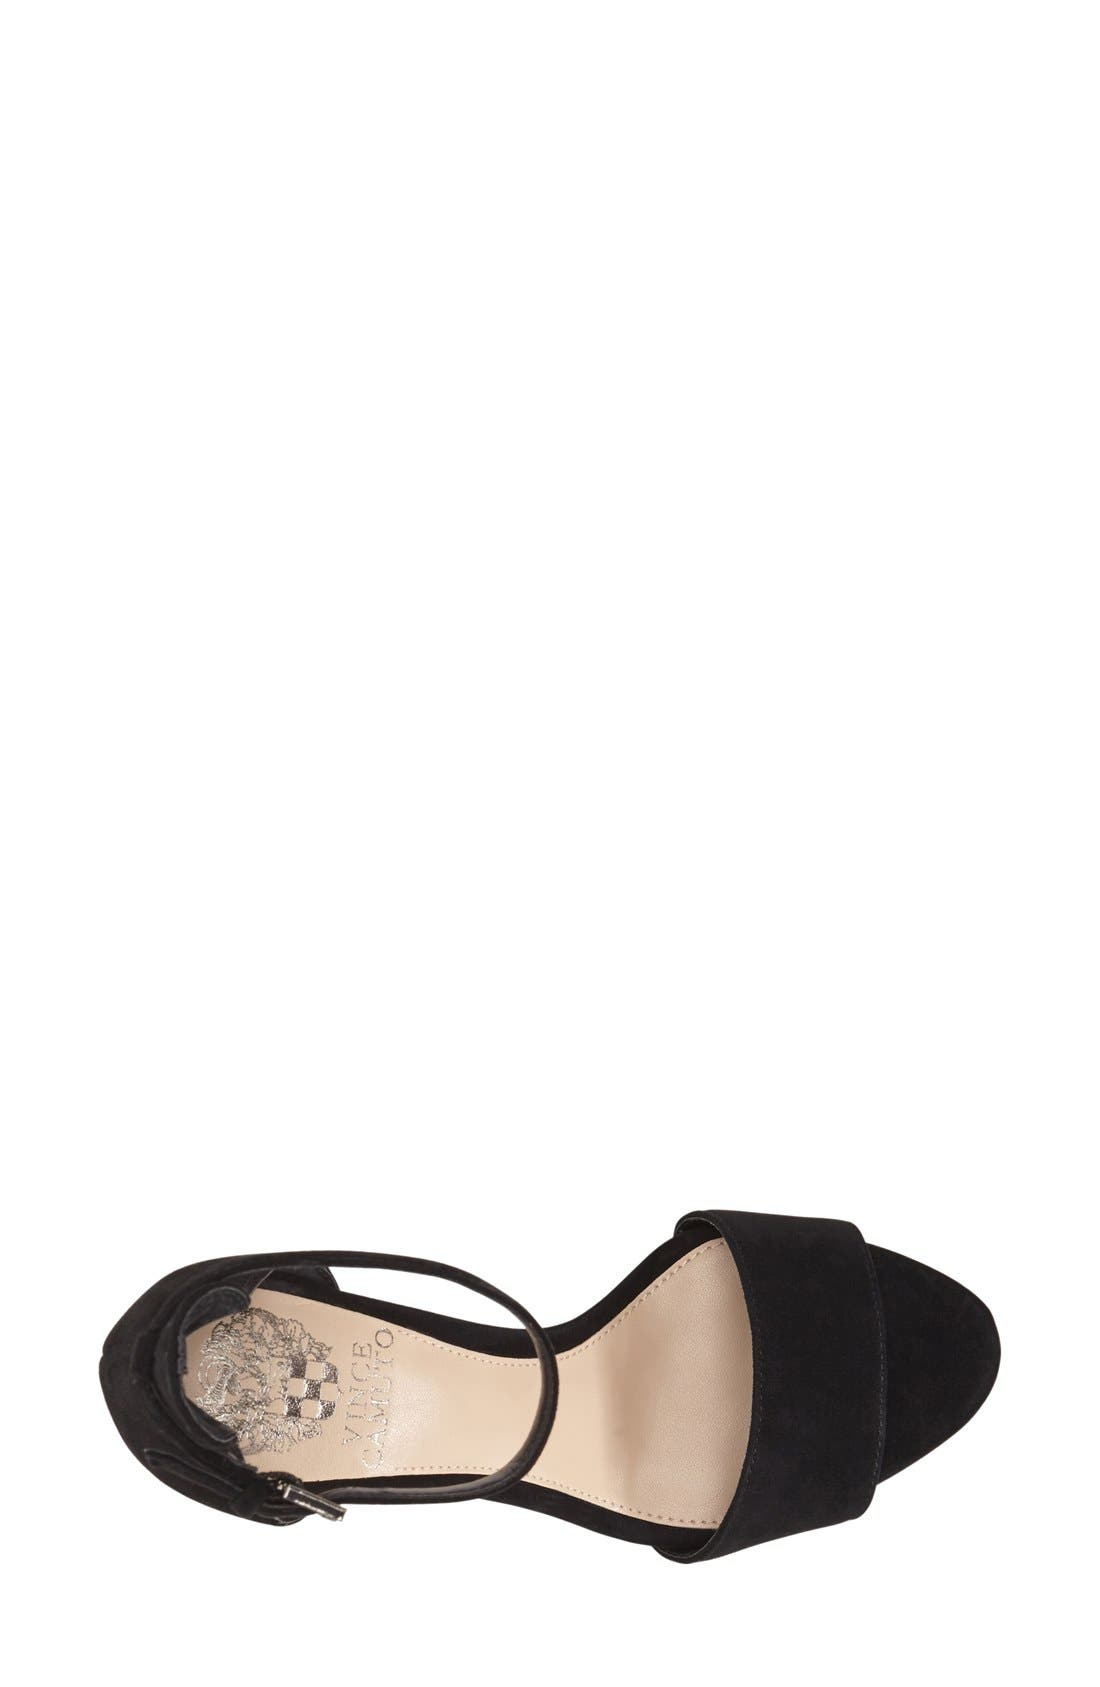 ,                             'Court' Ankle Strap Sandal,                             Alternate thumbnail 18, color,                             004